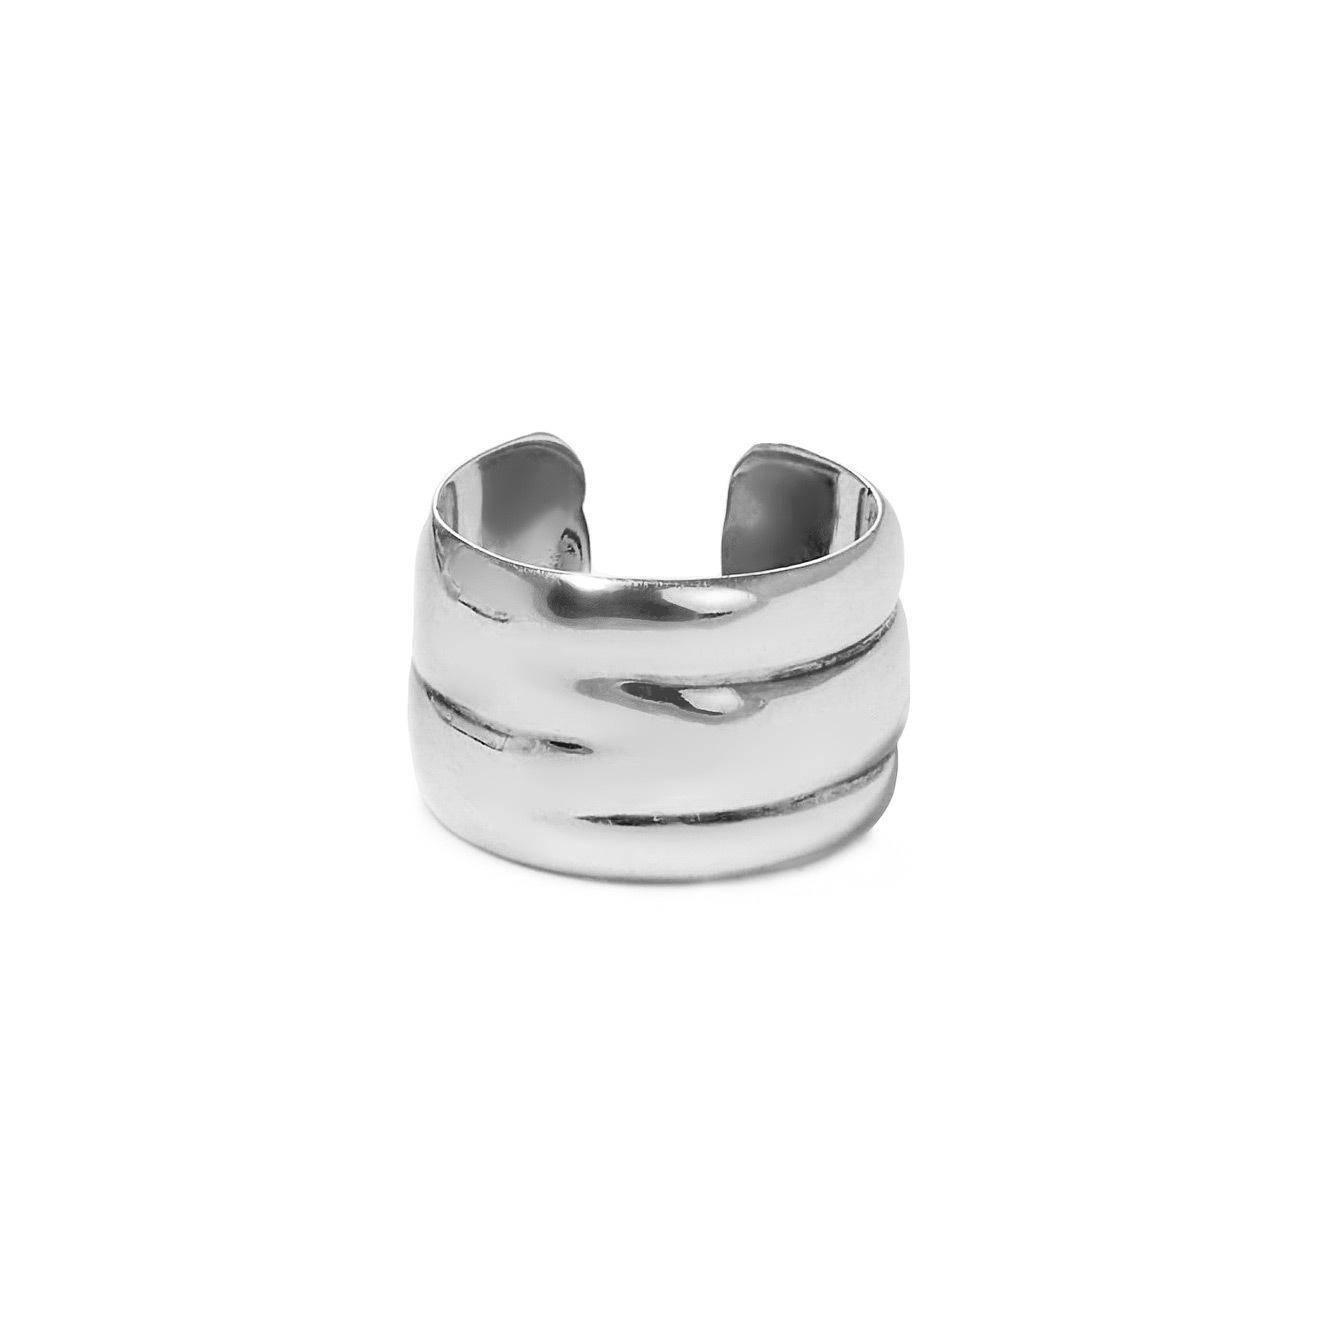 Philippe Audibert Покрытое серебром кольцо Bague Caro